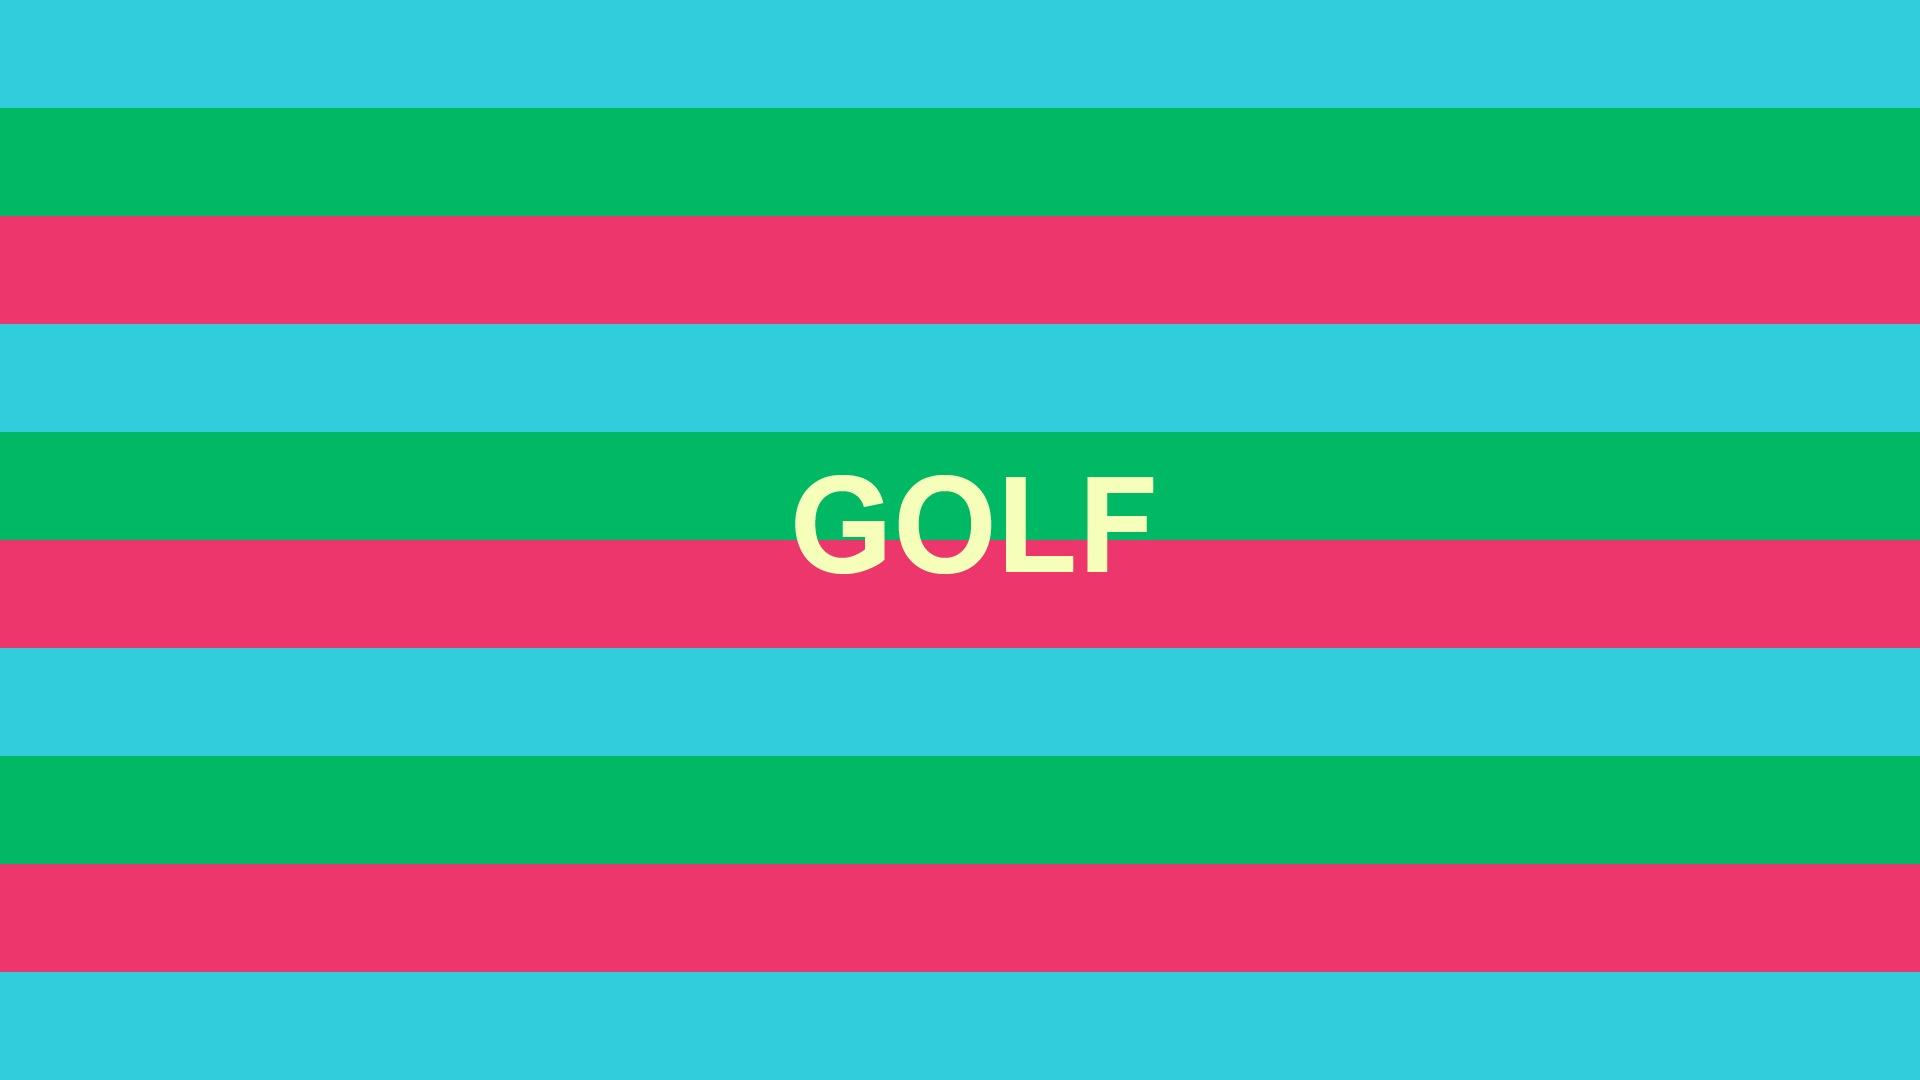 download wallpaper ofwgkta, golf wang, tyler the creator, section